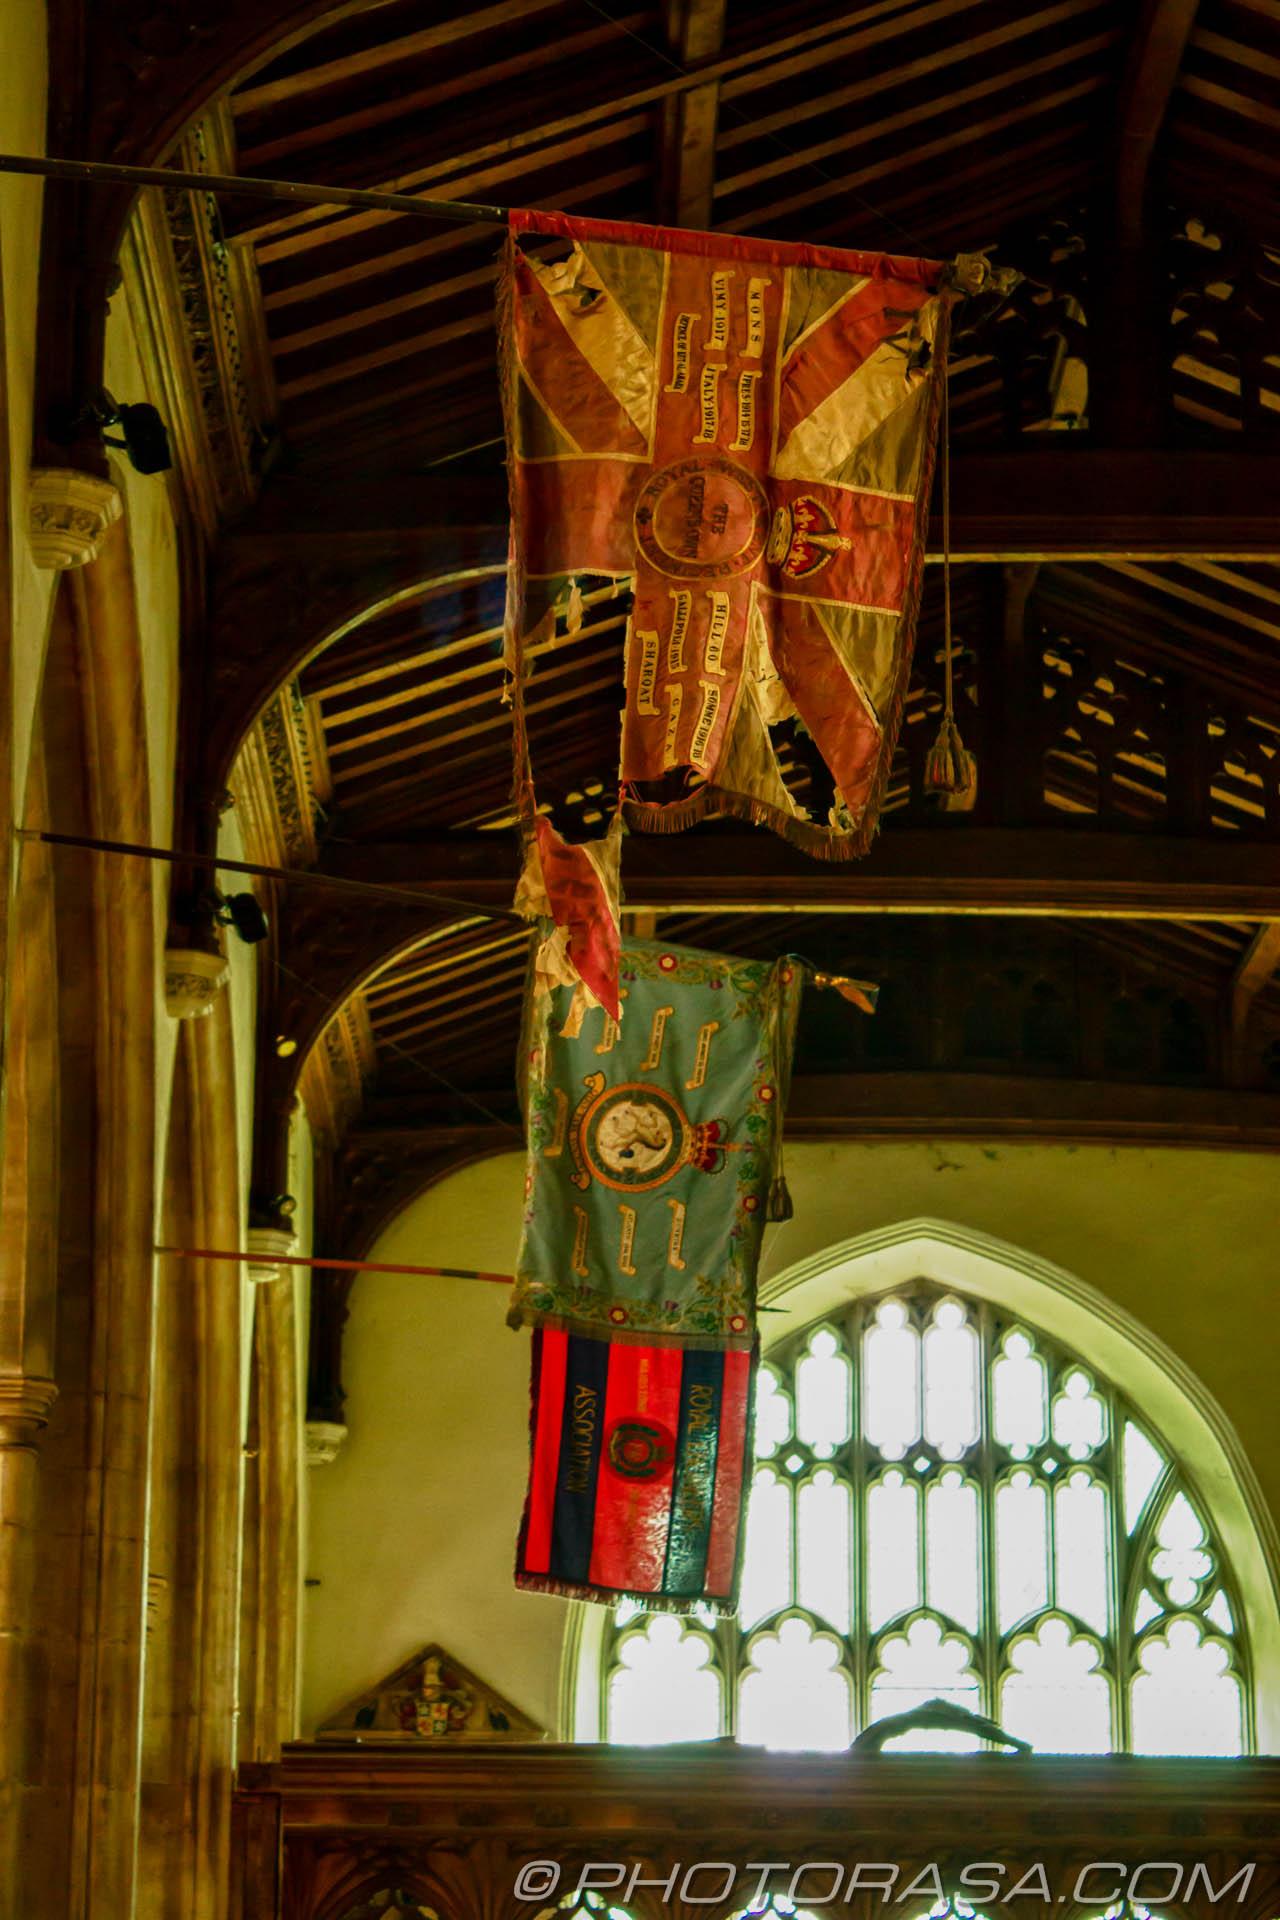 https://photorasa.com/inside-all-saints-church-in-maidstone/torn-british-flag-in-church/